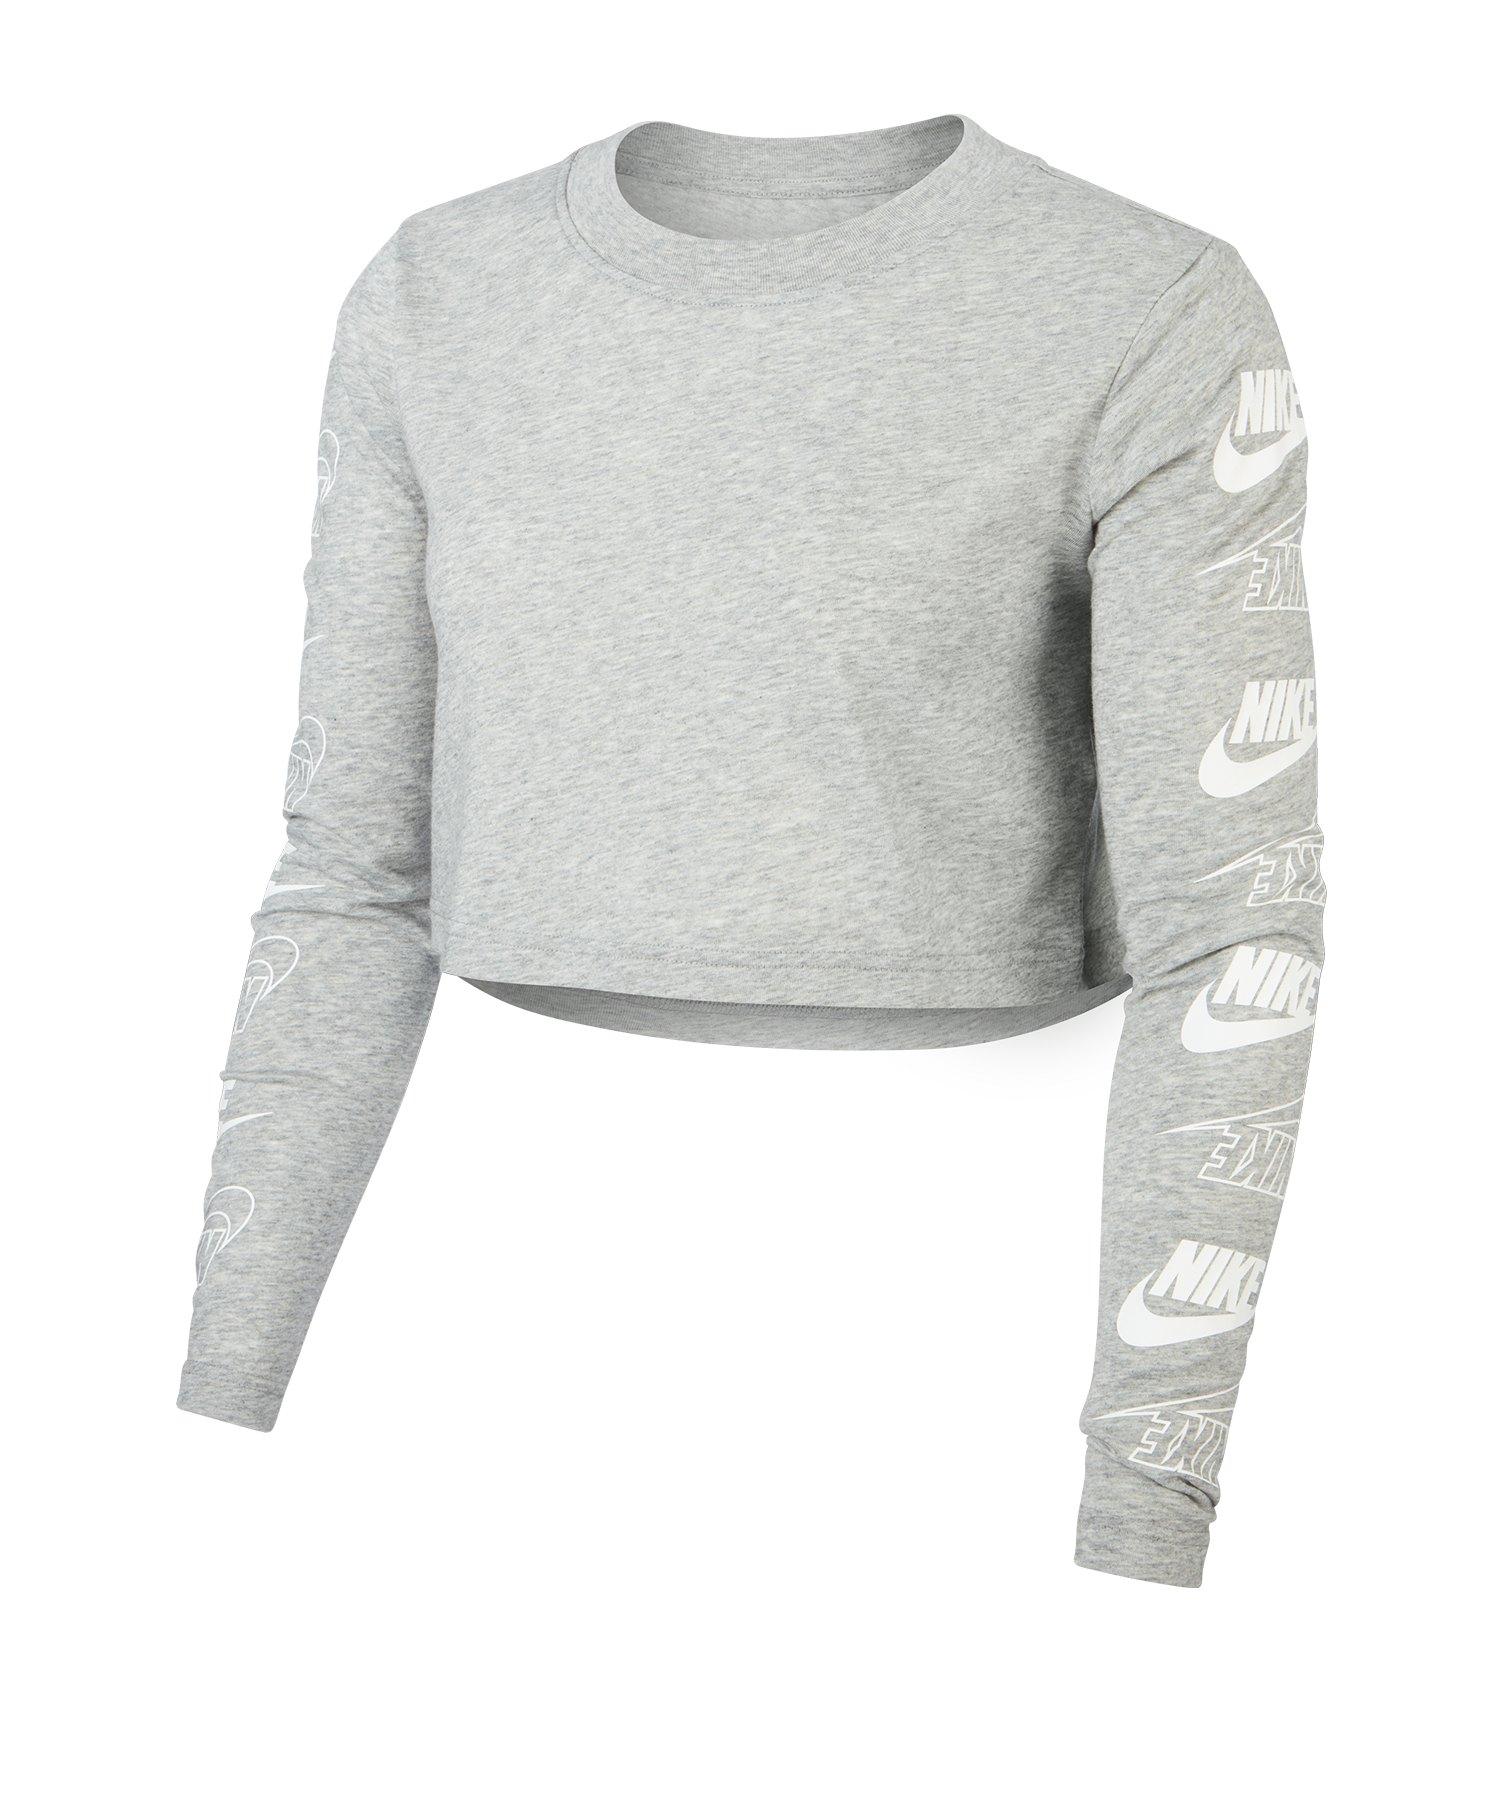 Nike Cropped Longsleeve T Shirt langarm Damen F063